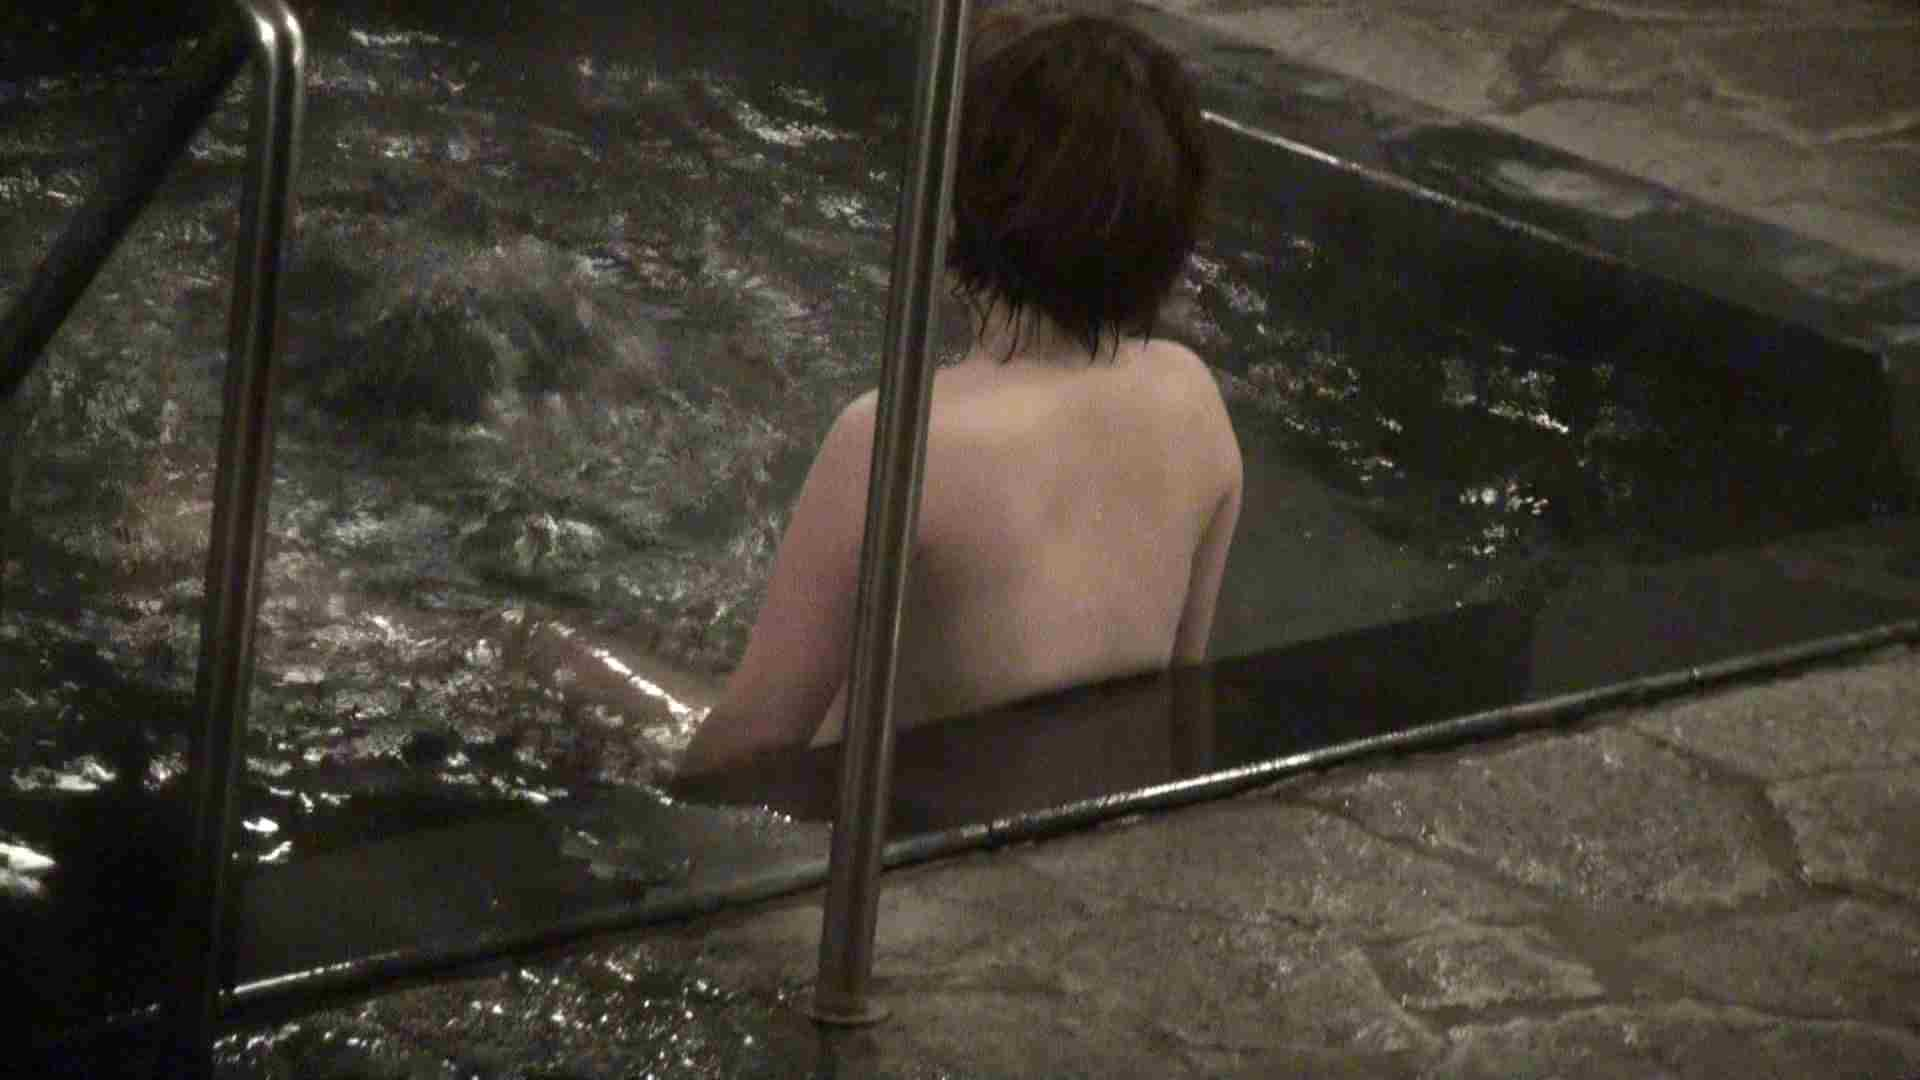 Aquaな露天風呂Vol.432 露天風呂 | OLのエロ生活  73連発 40